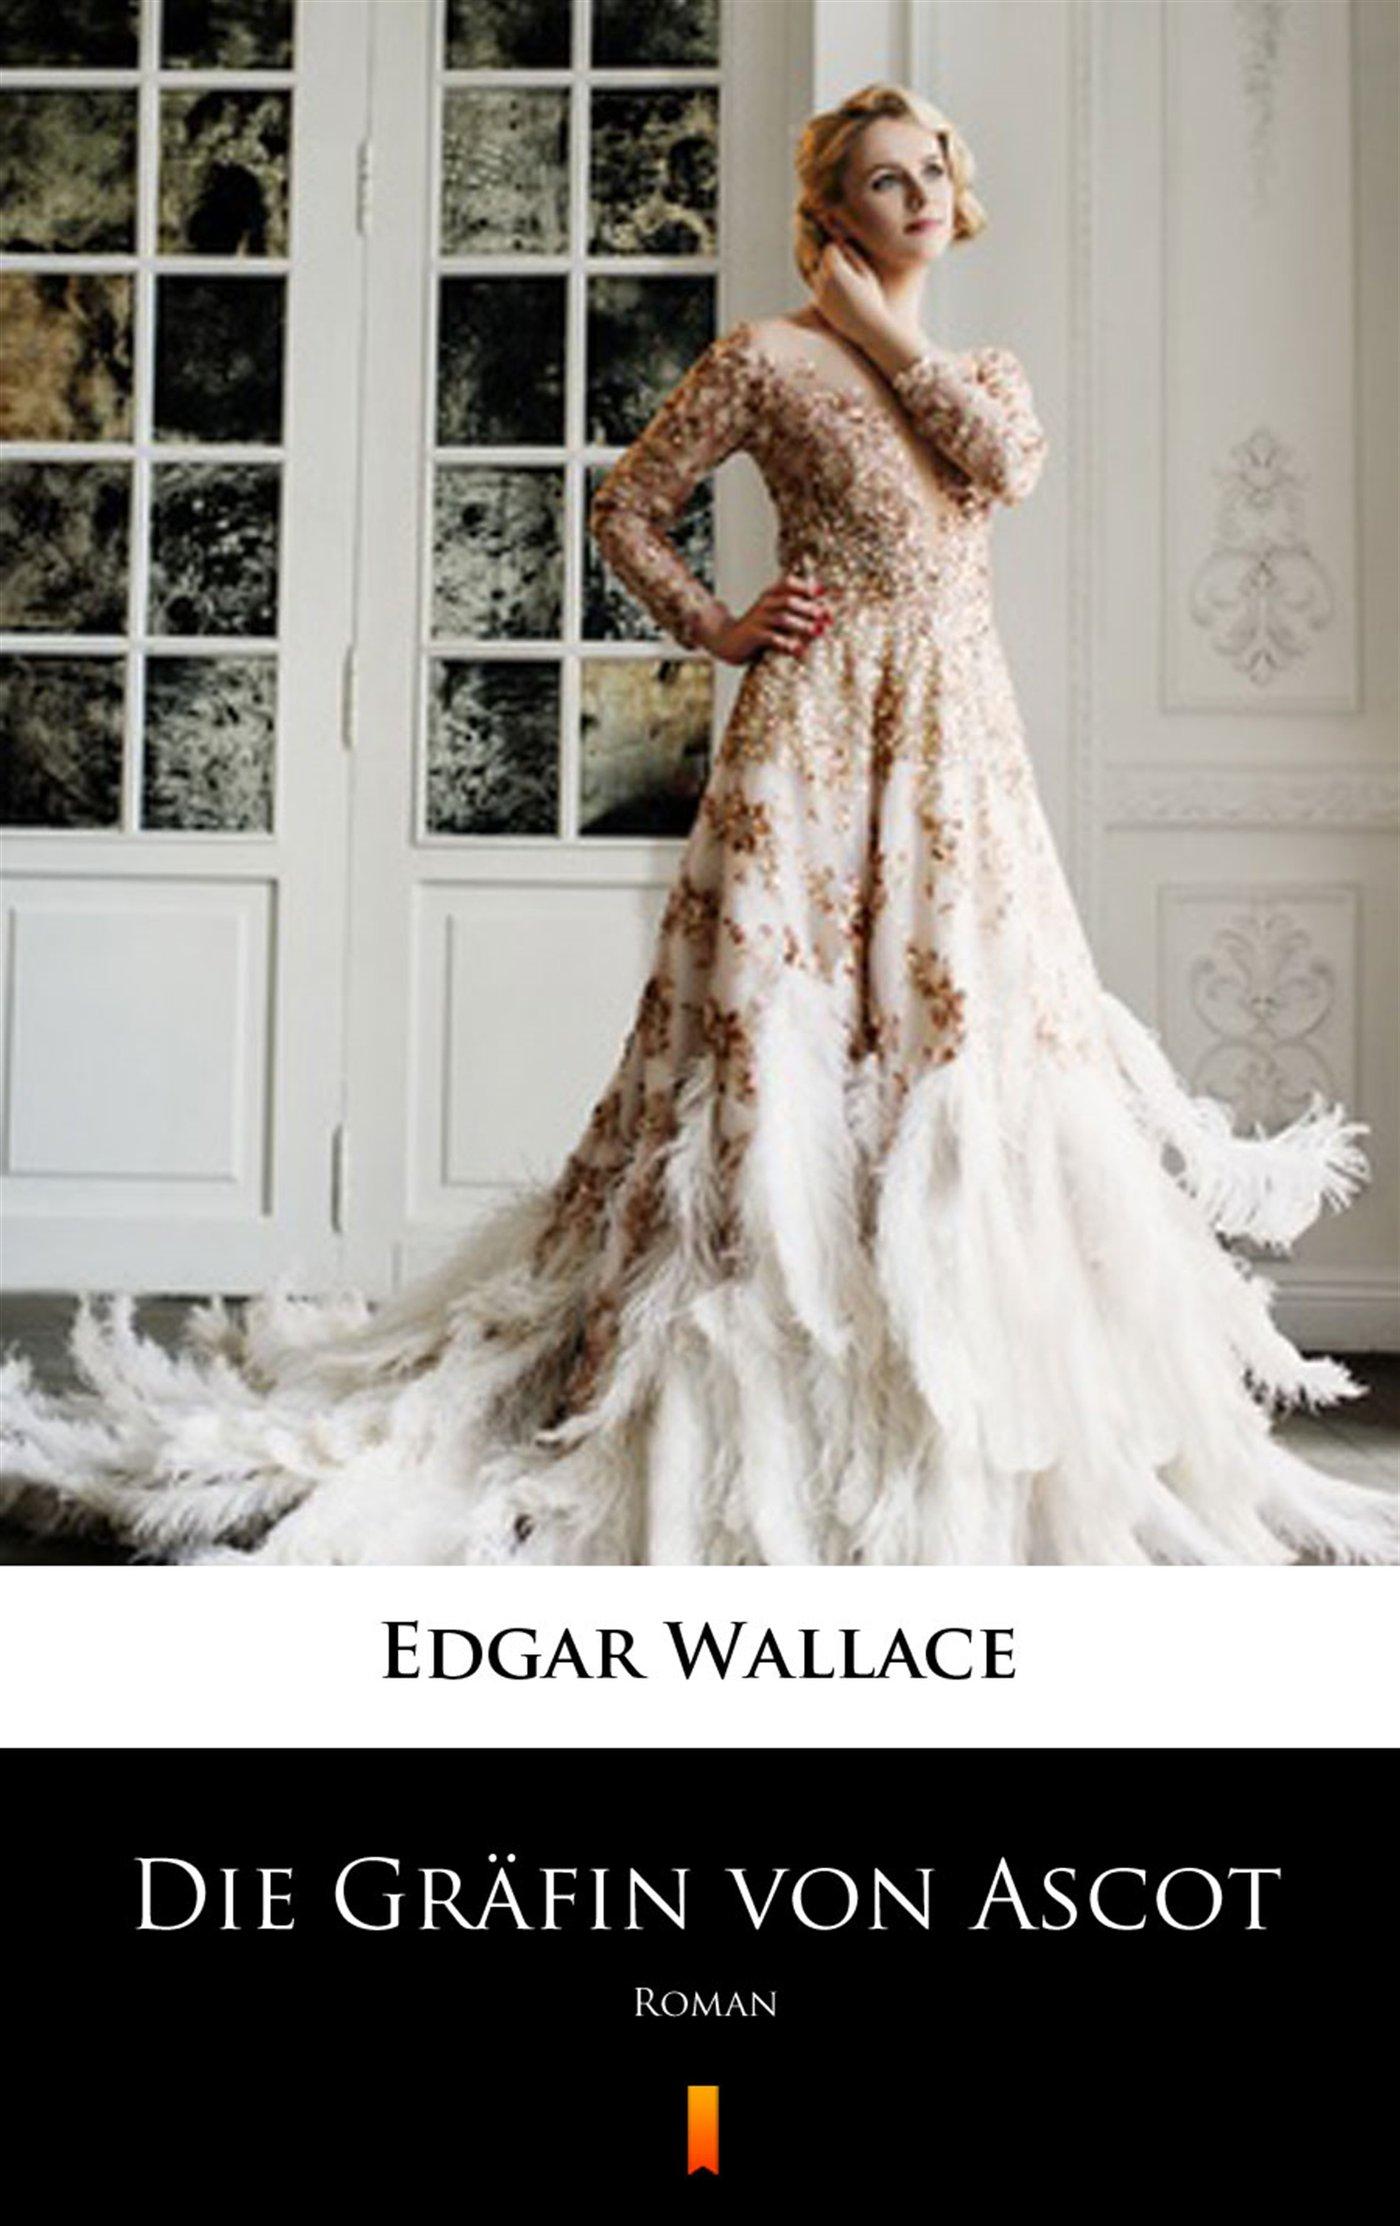 Die Gräfin von Ascot - Ebook (Książka EPUB) do pobrania w formacie EPUB